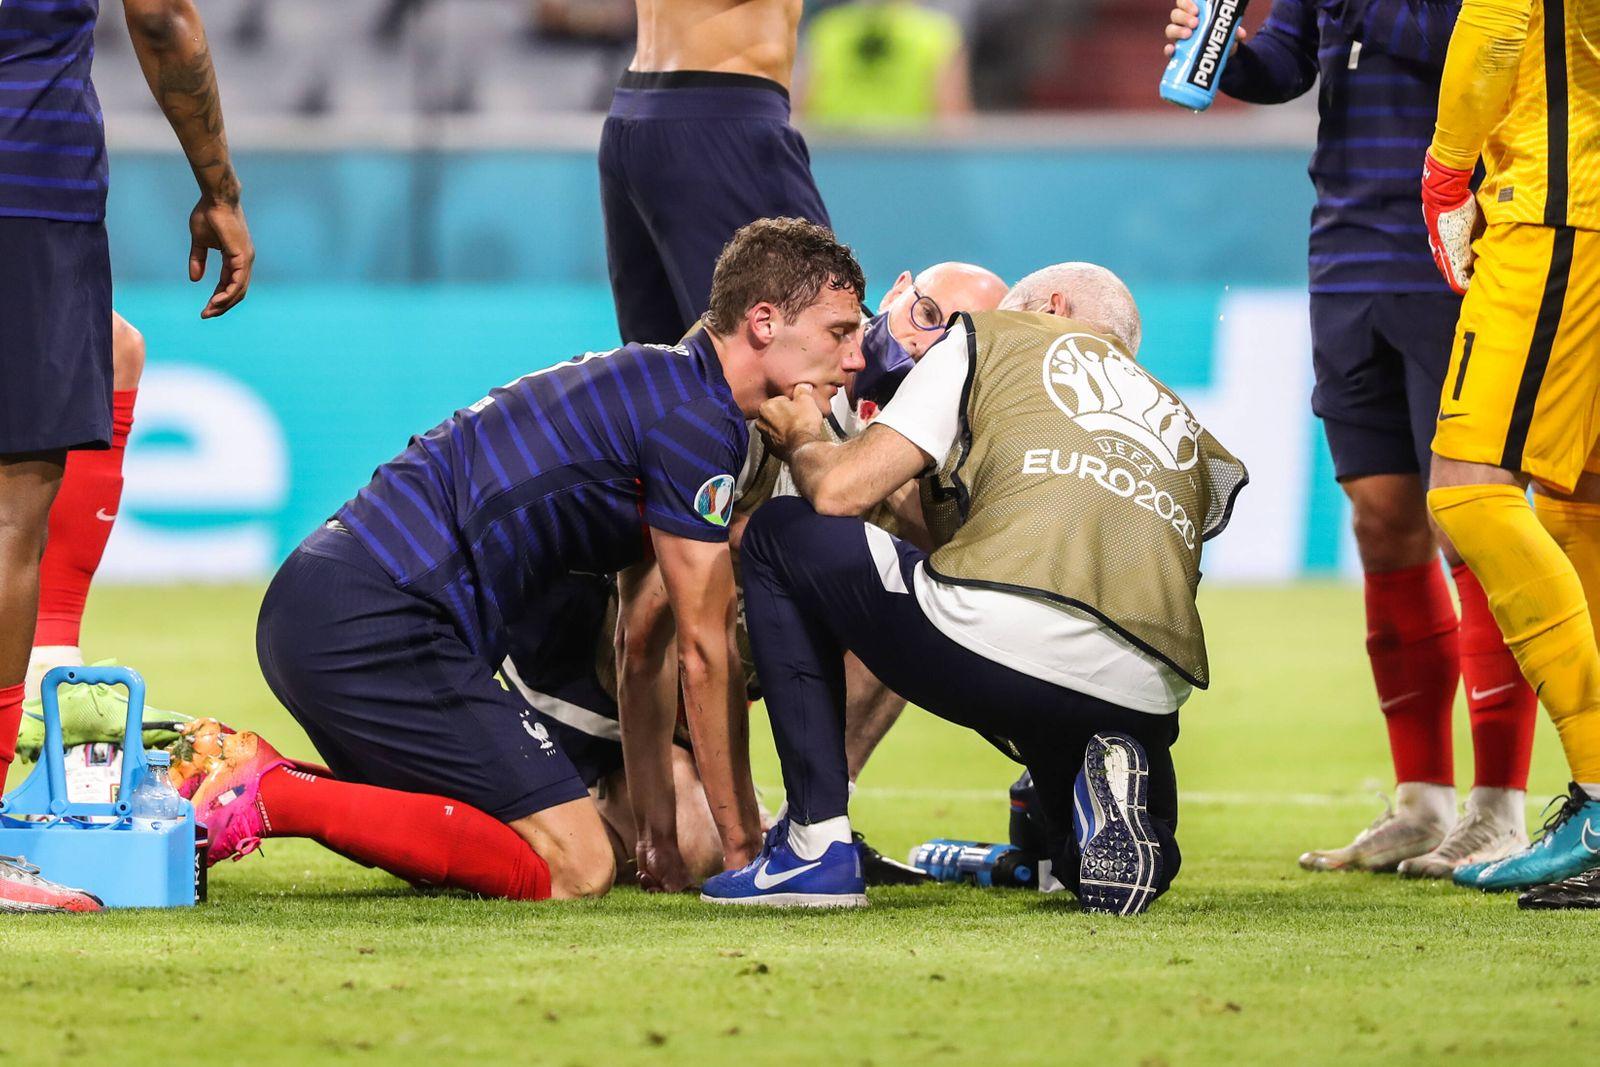 (210616) -- MUNICH, June 16, 2021 -- Benjamin Pavard (L) of France receives treatment during the UEFA EURO, EM, Europame